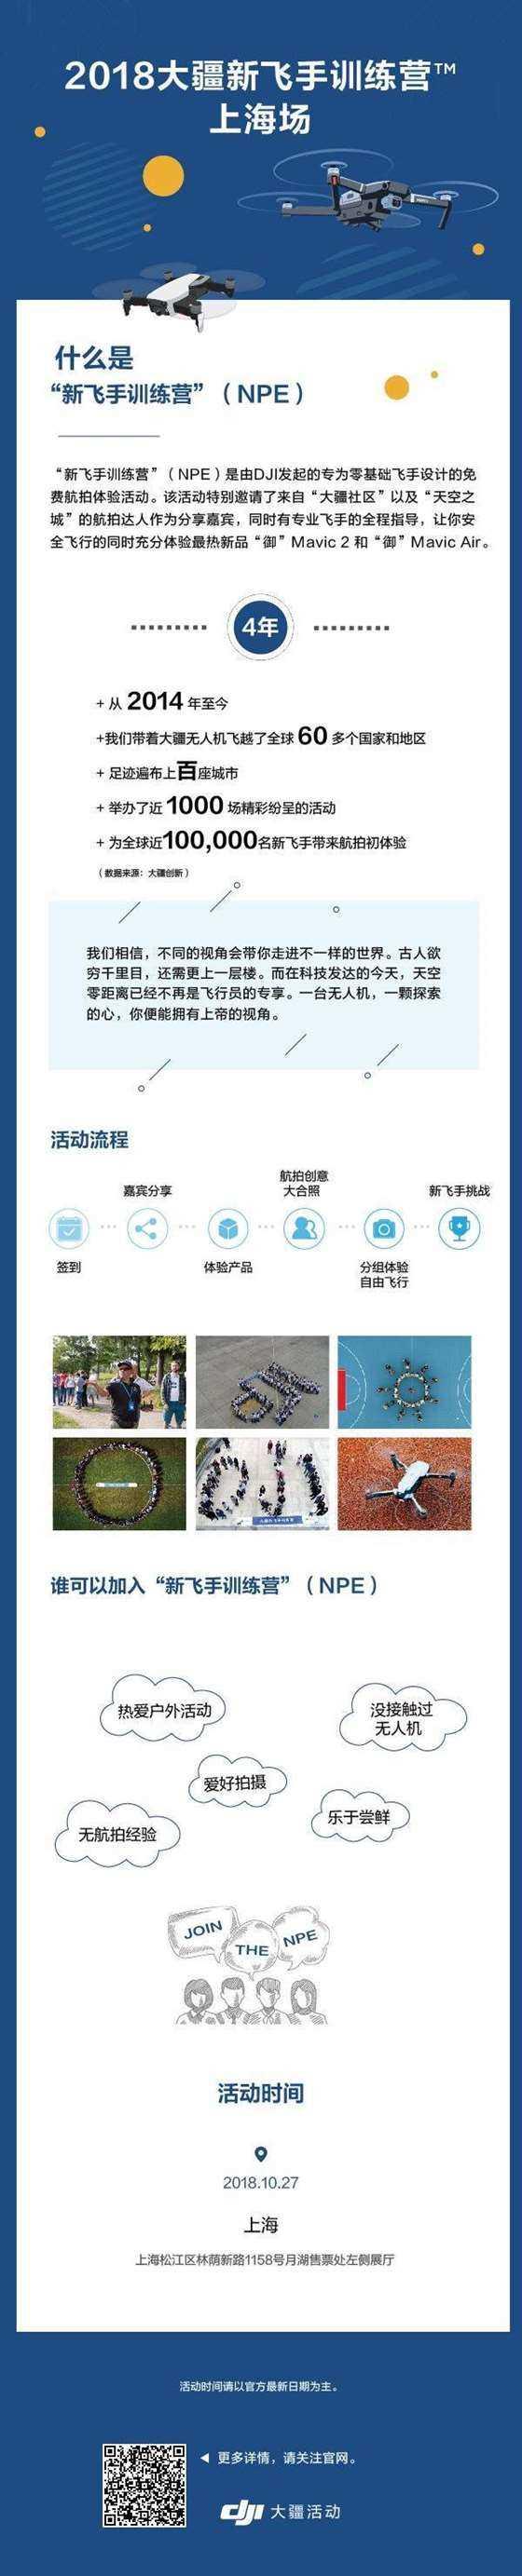 NPE活动宣传页_上海场.jpg